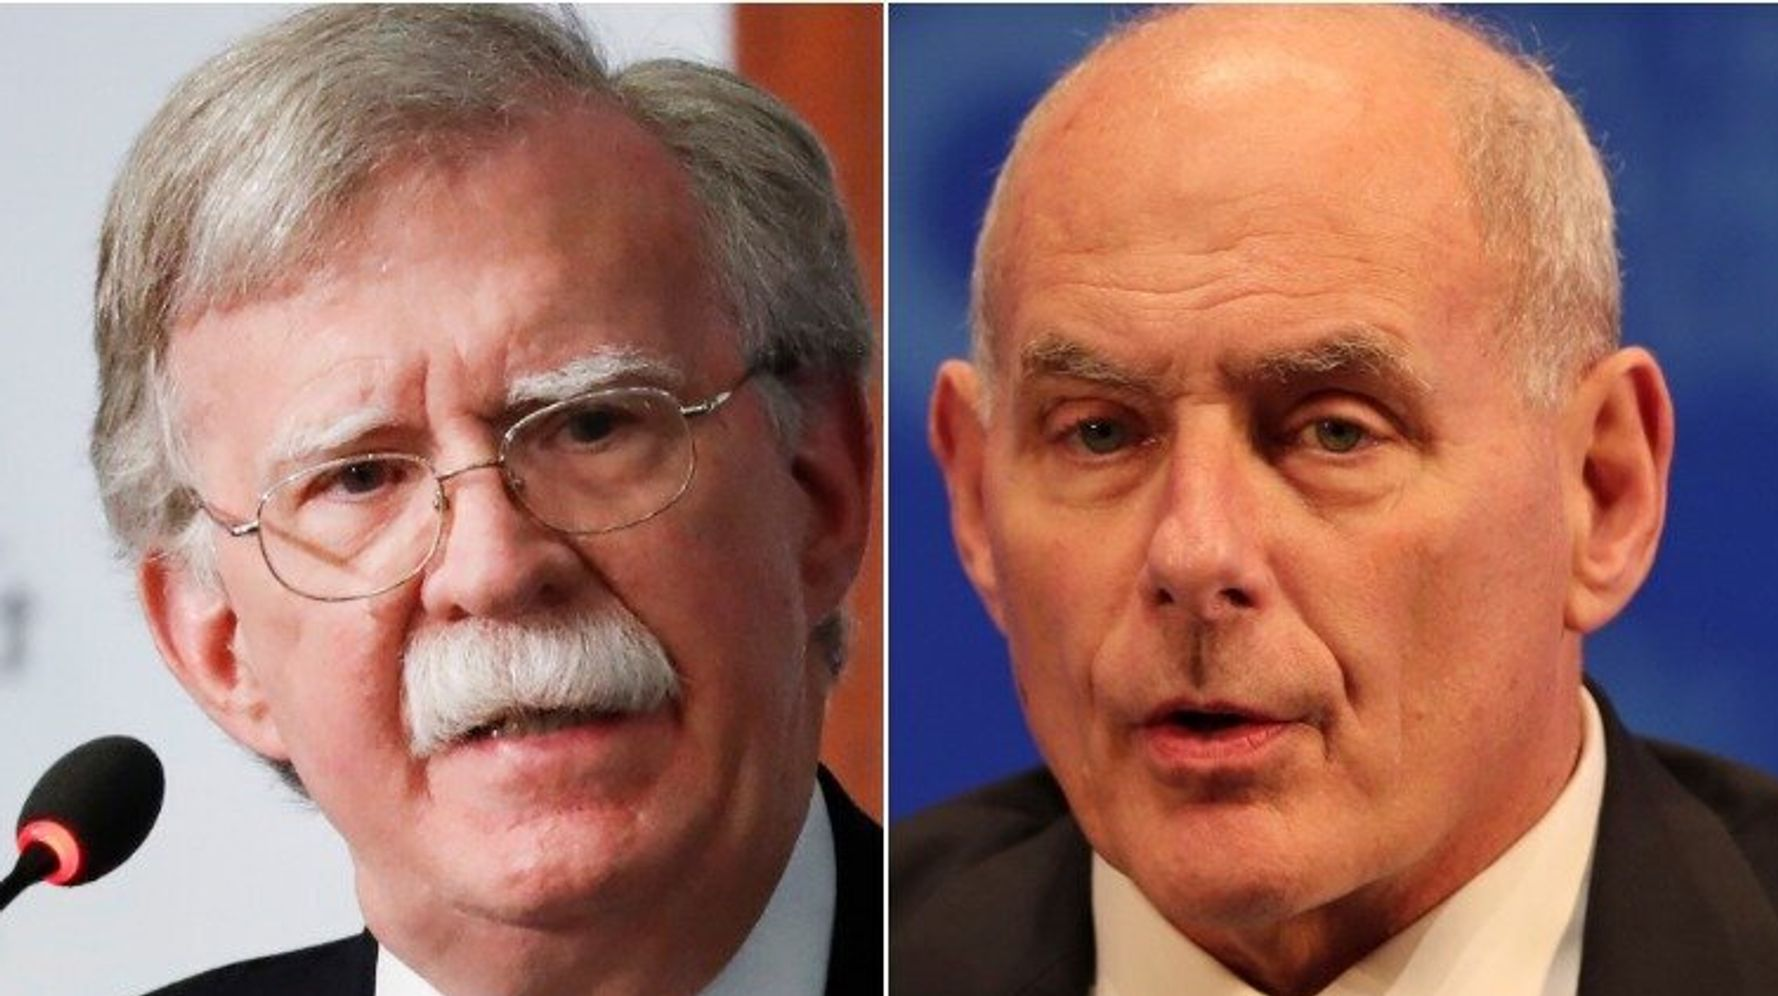 John Bolton's Praise Of 'Honorable' John Kelly Backfires Spectacularly